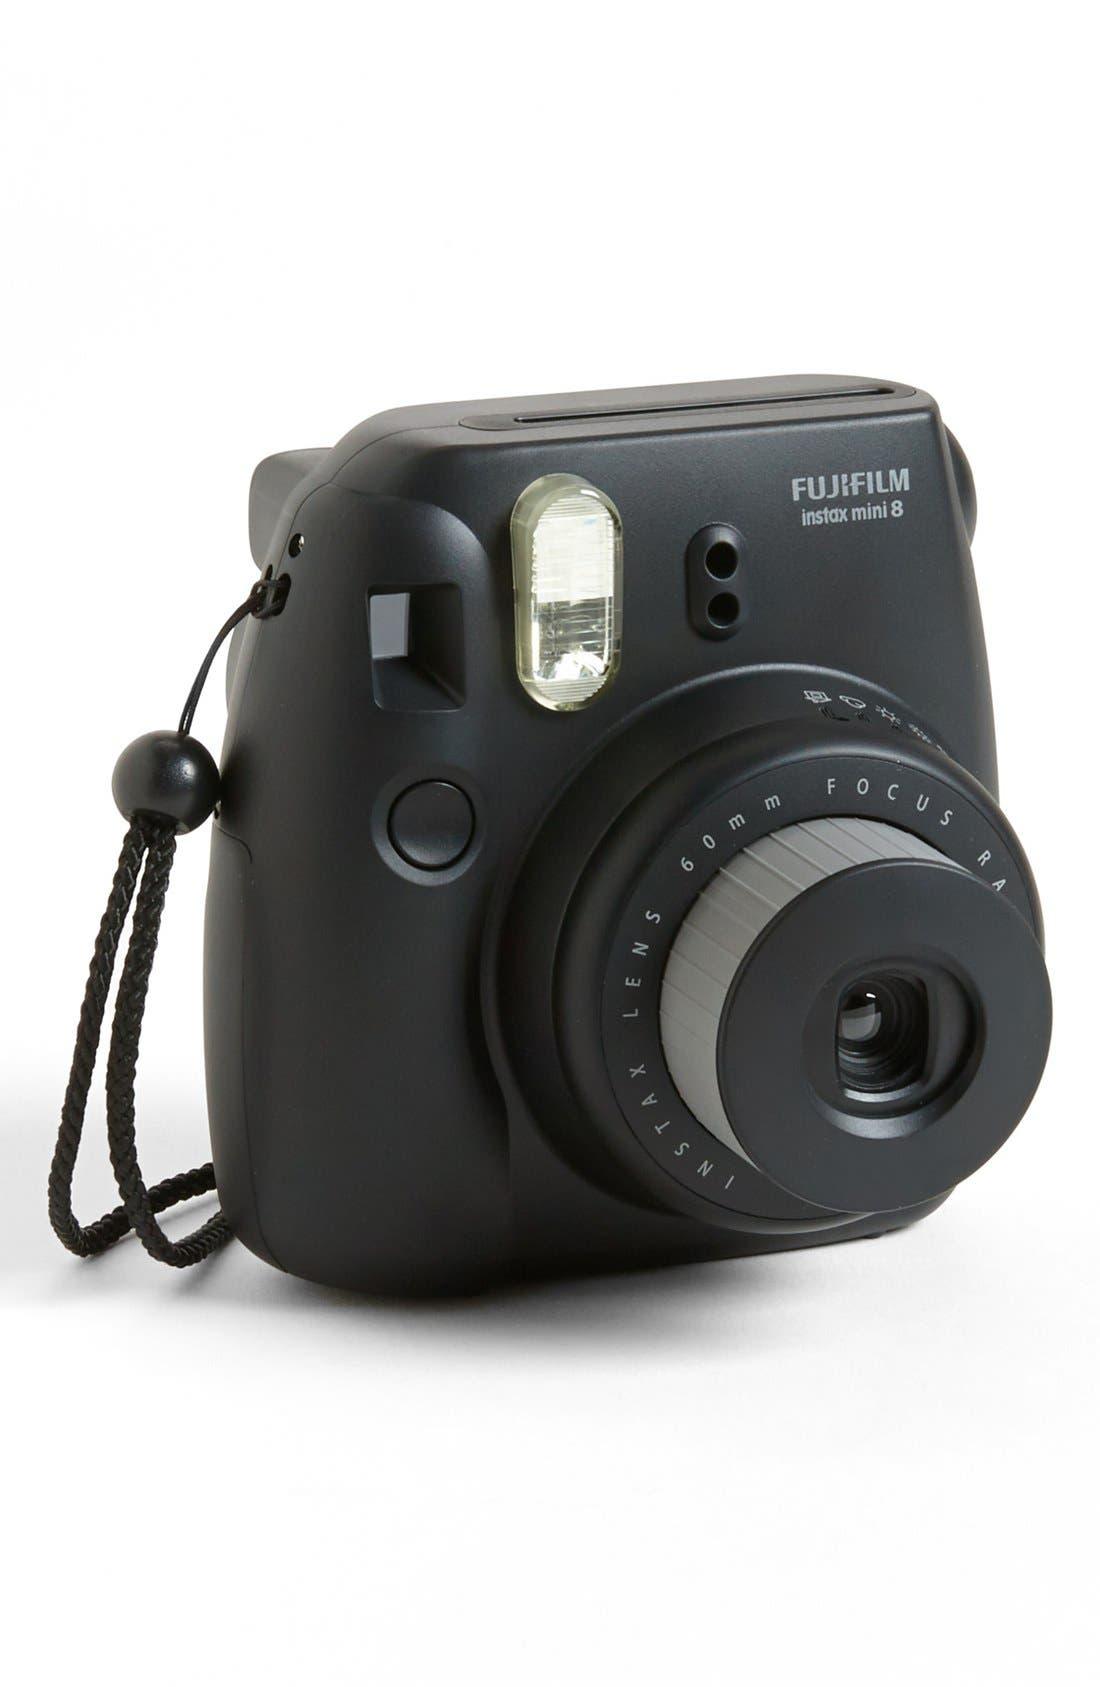 Alternate Image 1 Selected - Fujifilm 'instax mini 8' Instant Film Camera